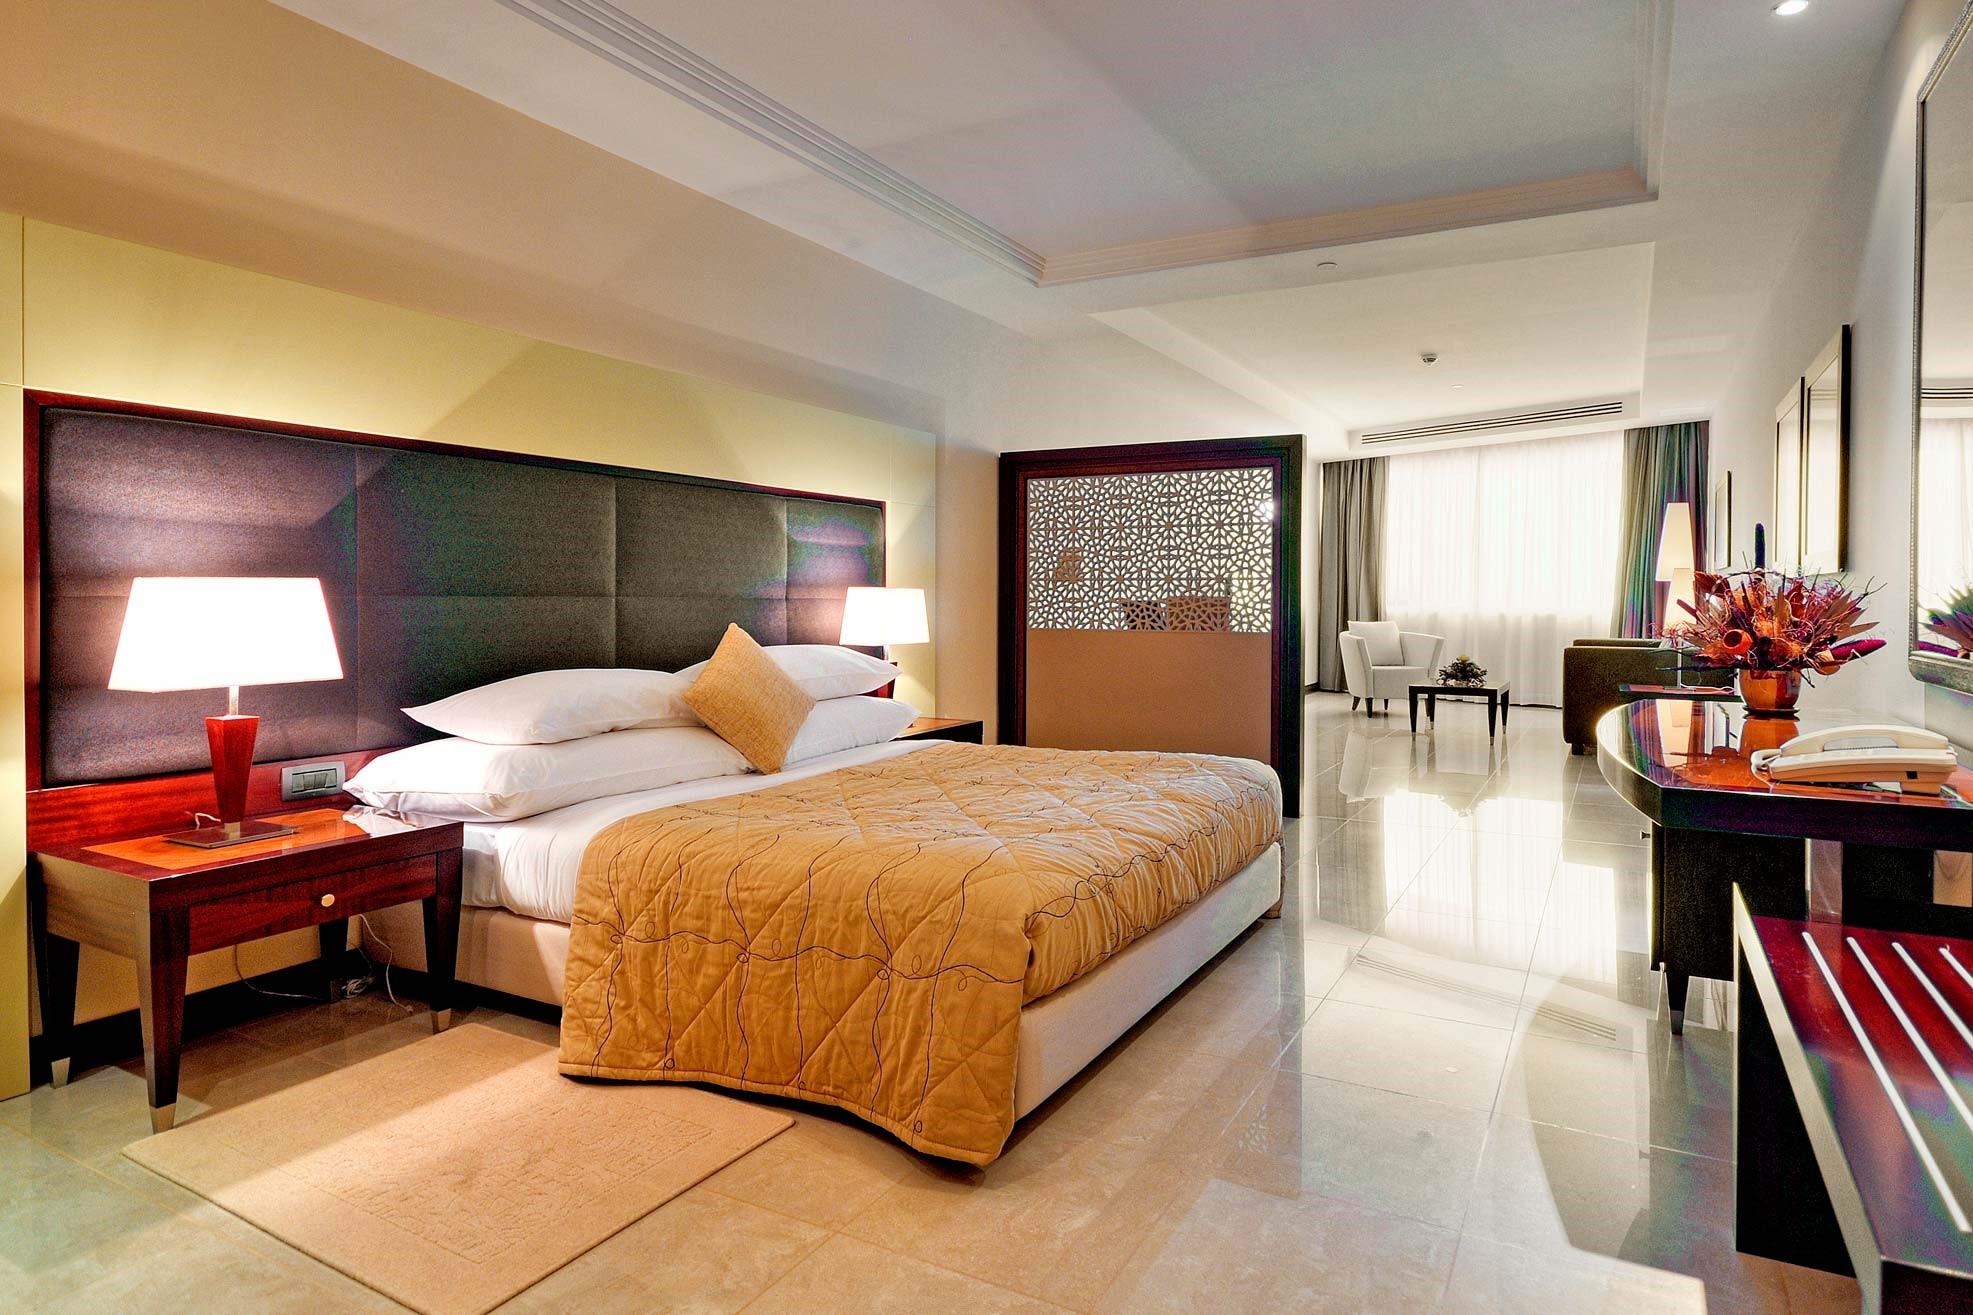 Executive Room | Luxury Hotel Rooms in Khartoum